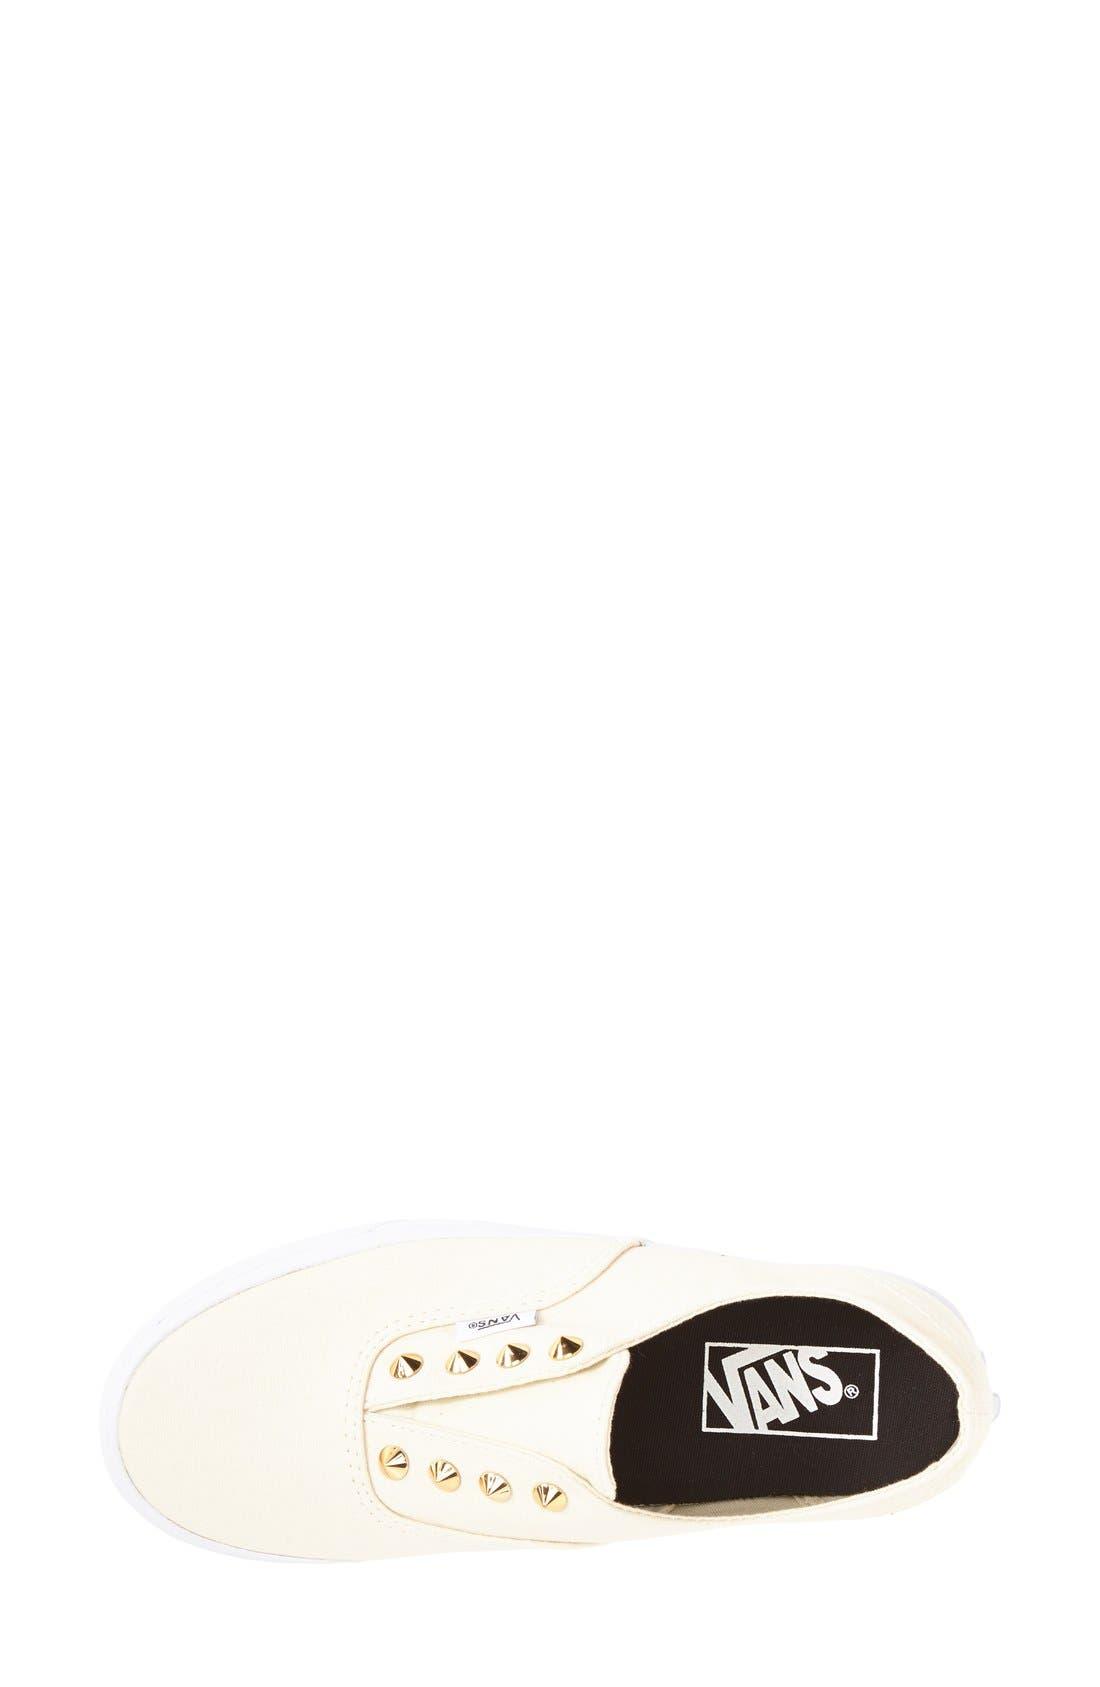 Alternate Image 3  - Vans 'Authentic Gore - Studs' Slip-On Sneaker (Women)